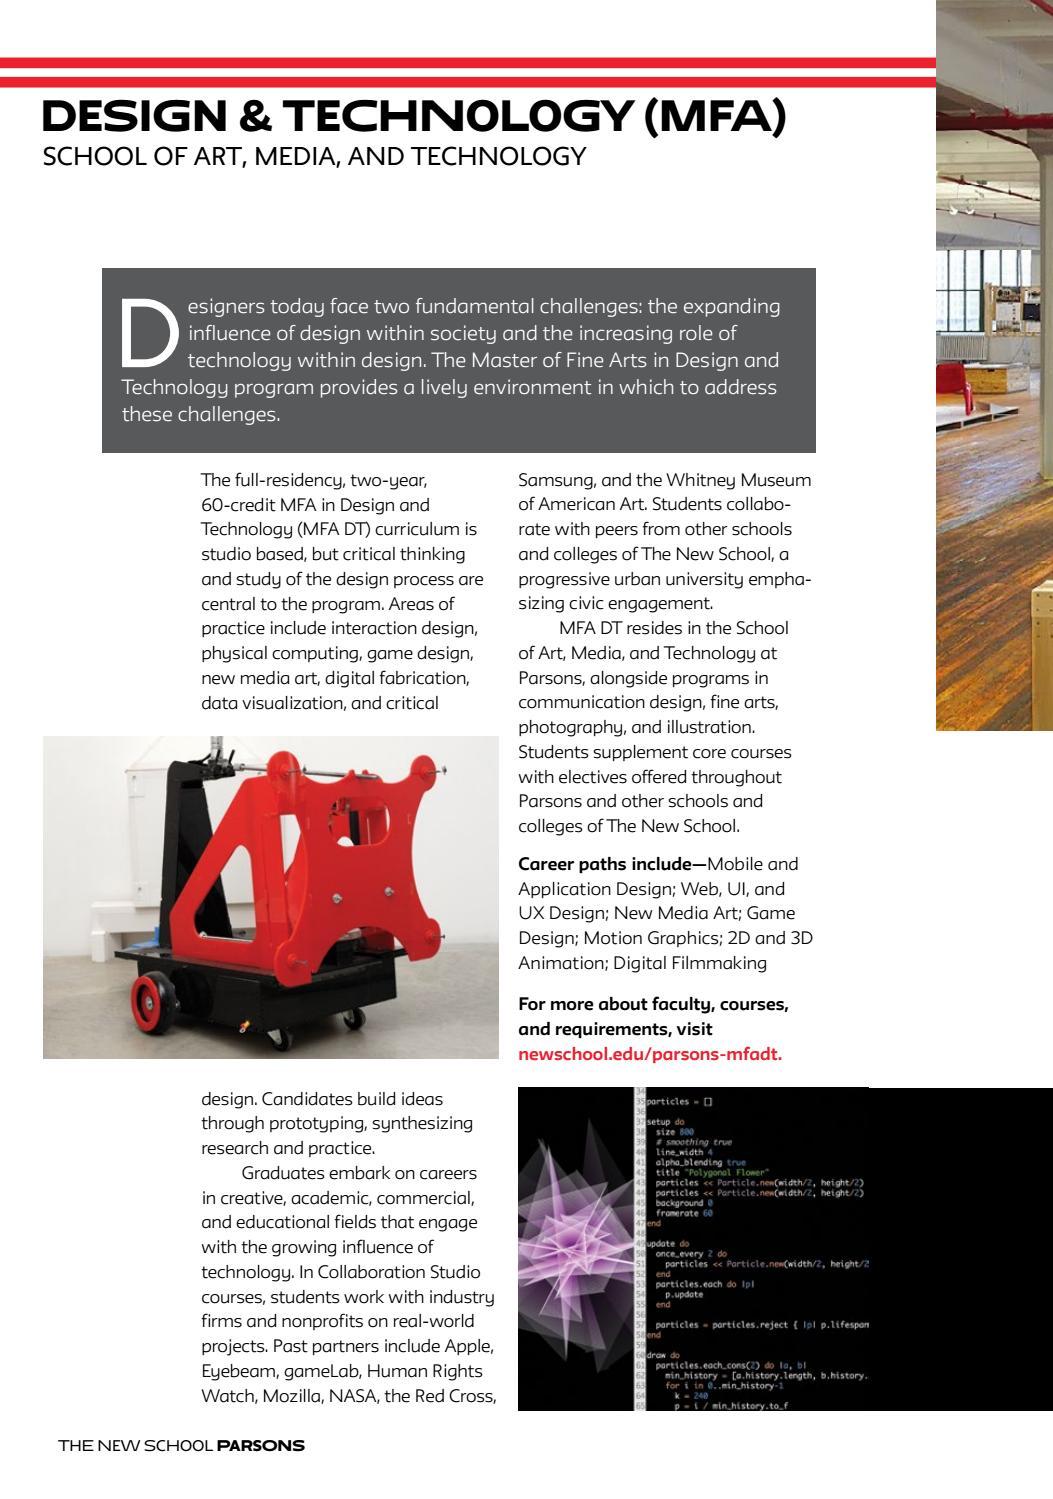 2016 Parsons School Of Design Graduate Viewbook By The New School Issuu